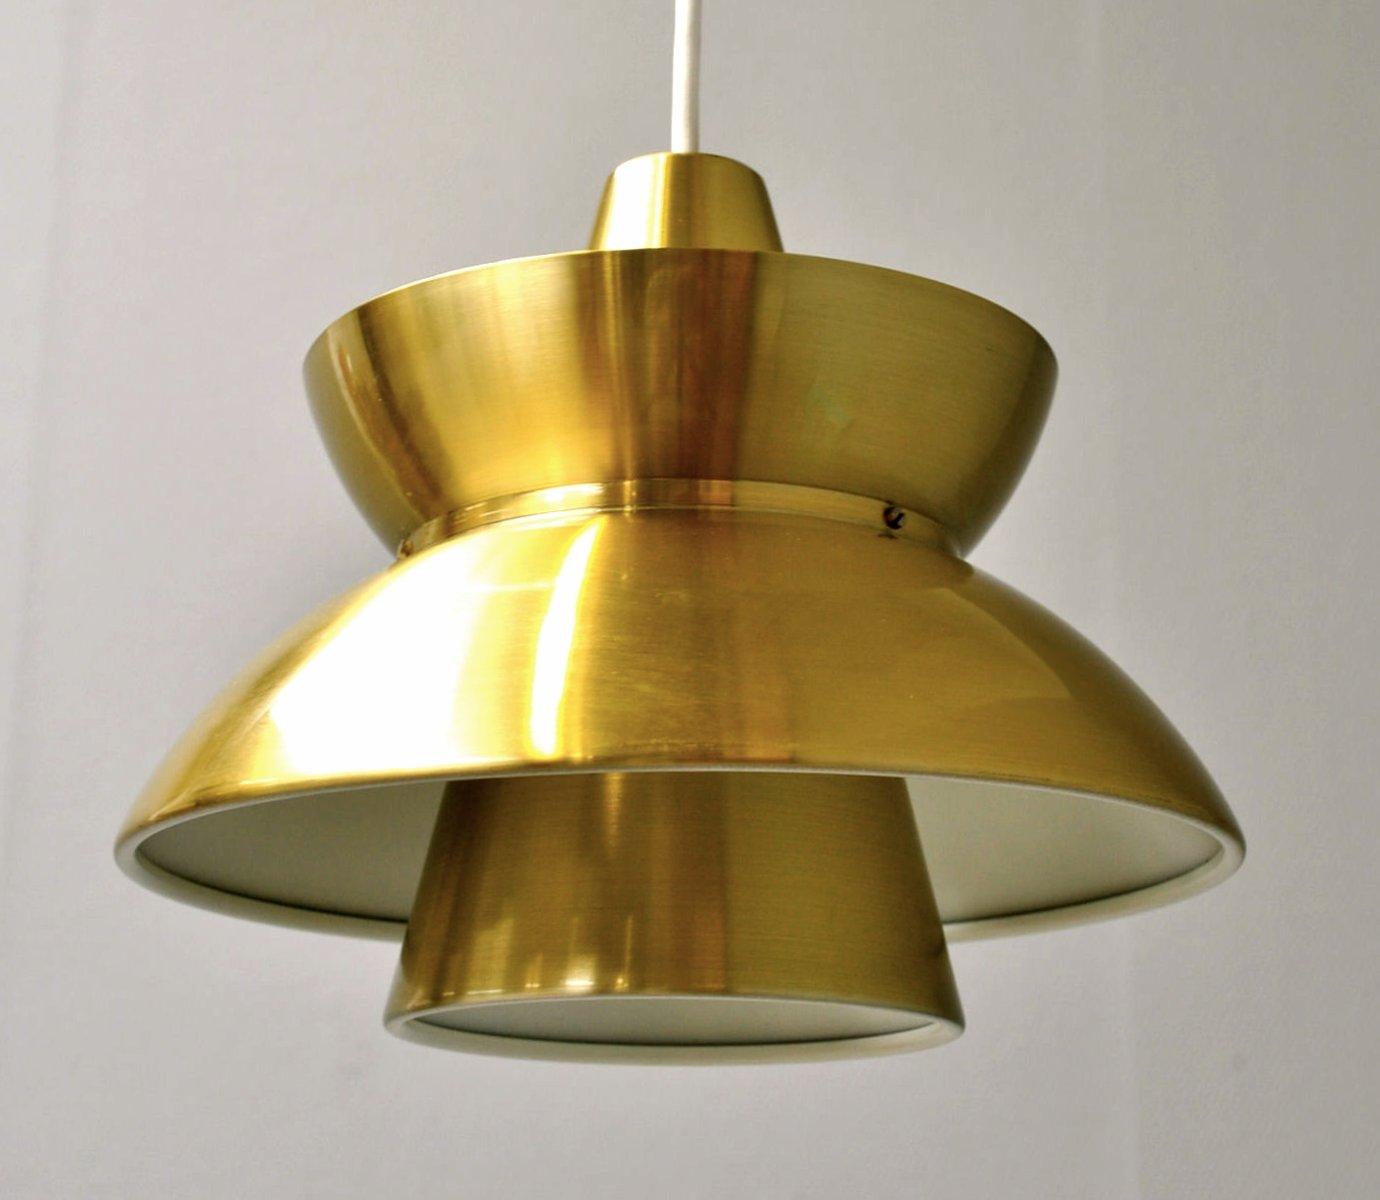 Vintage Brass Søværnspendel Pendant By Jorn Utzon For